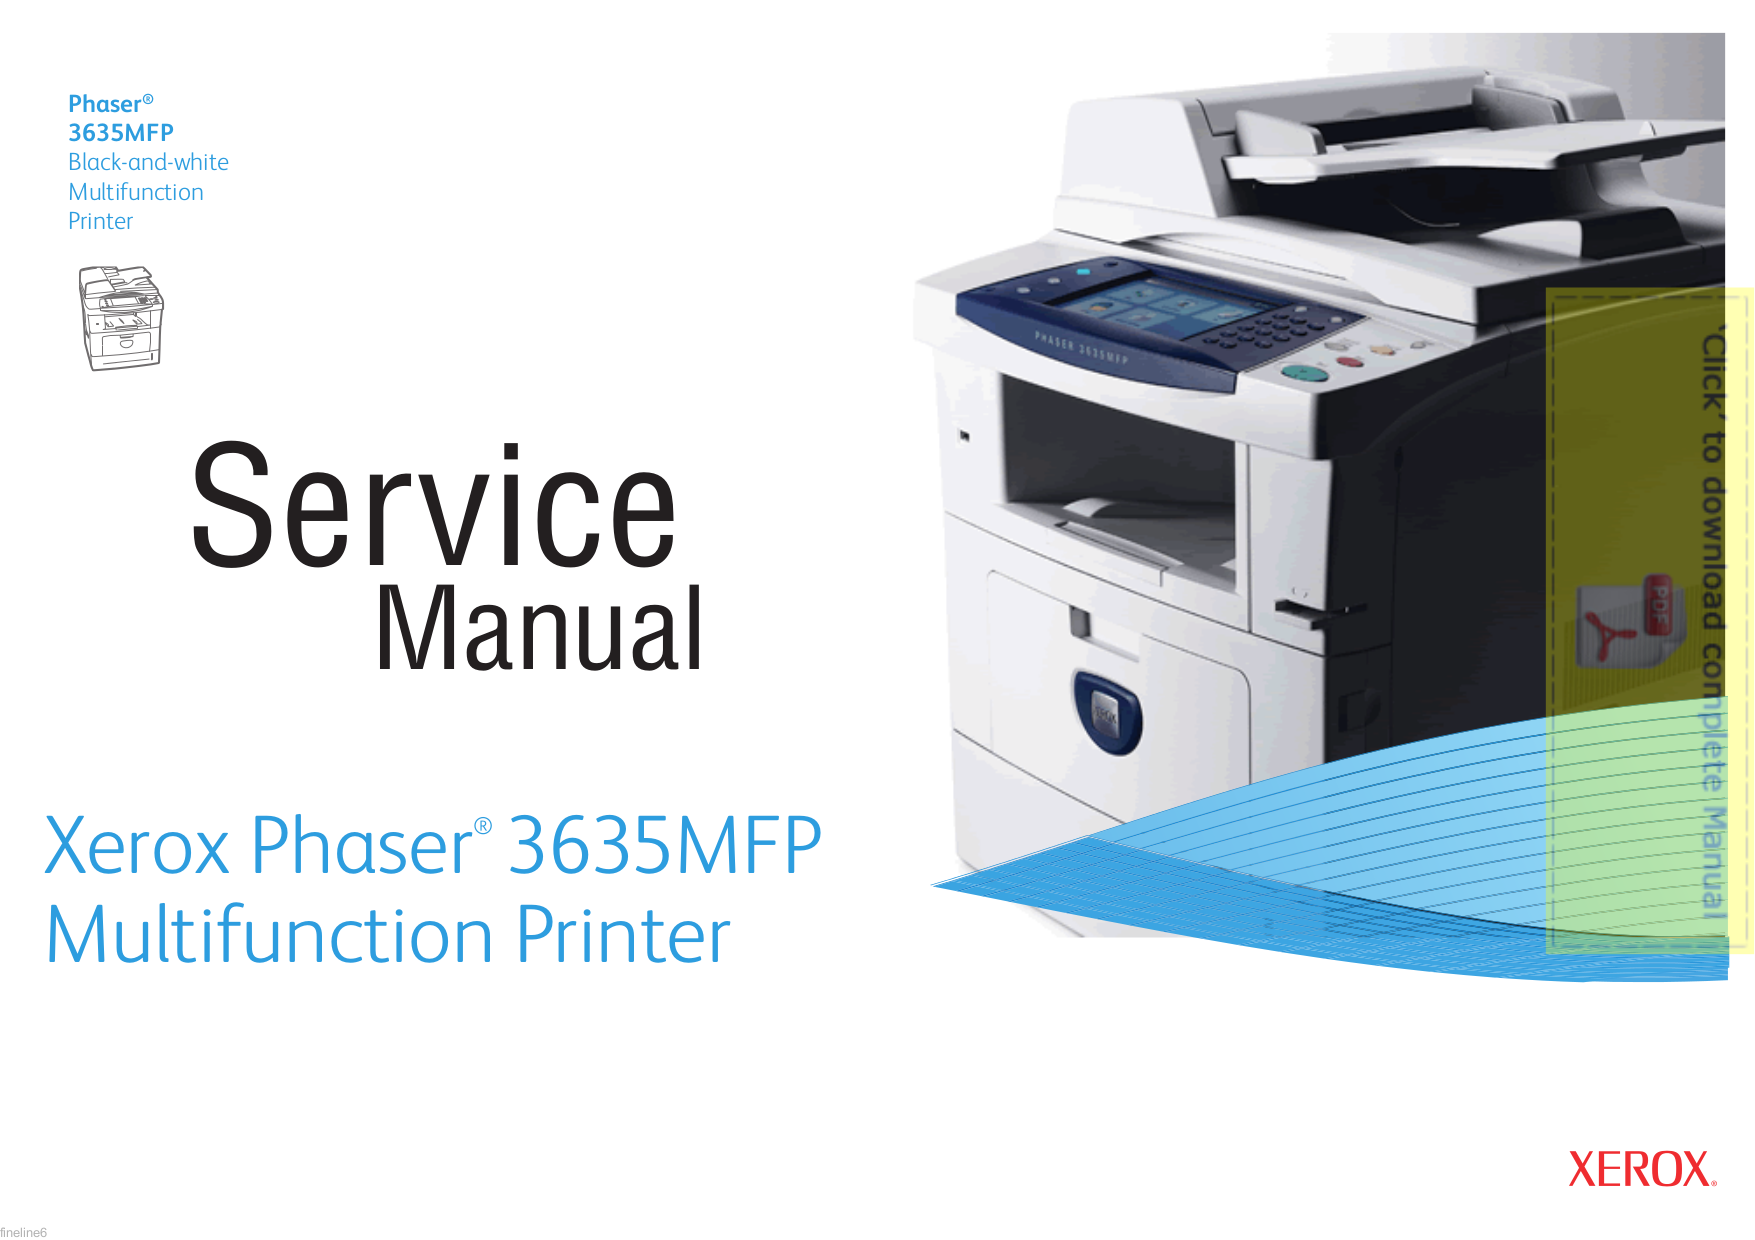 download free pdf for xerox phaser 3635mfp multifunction printer manual rh umlib com Xerox 3635 Printer Driver Xerox 3635 Printer Driver